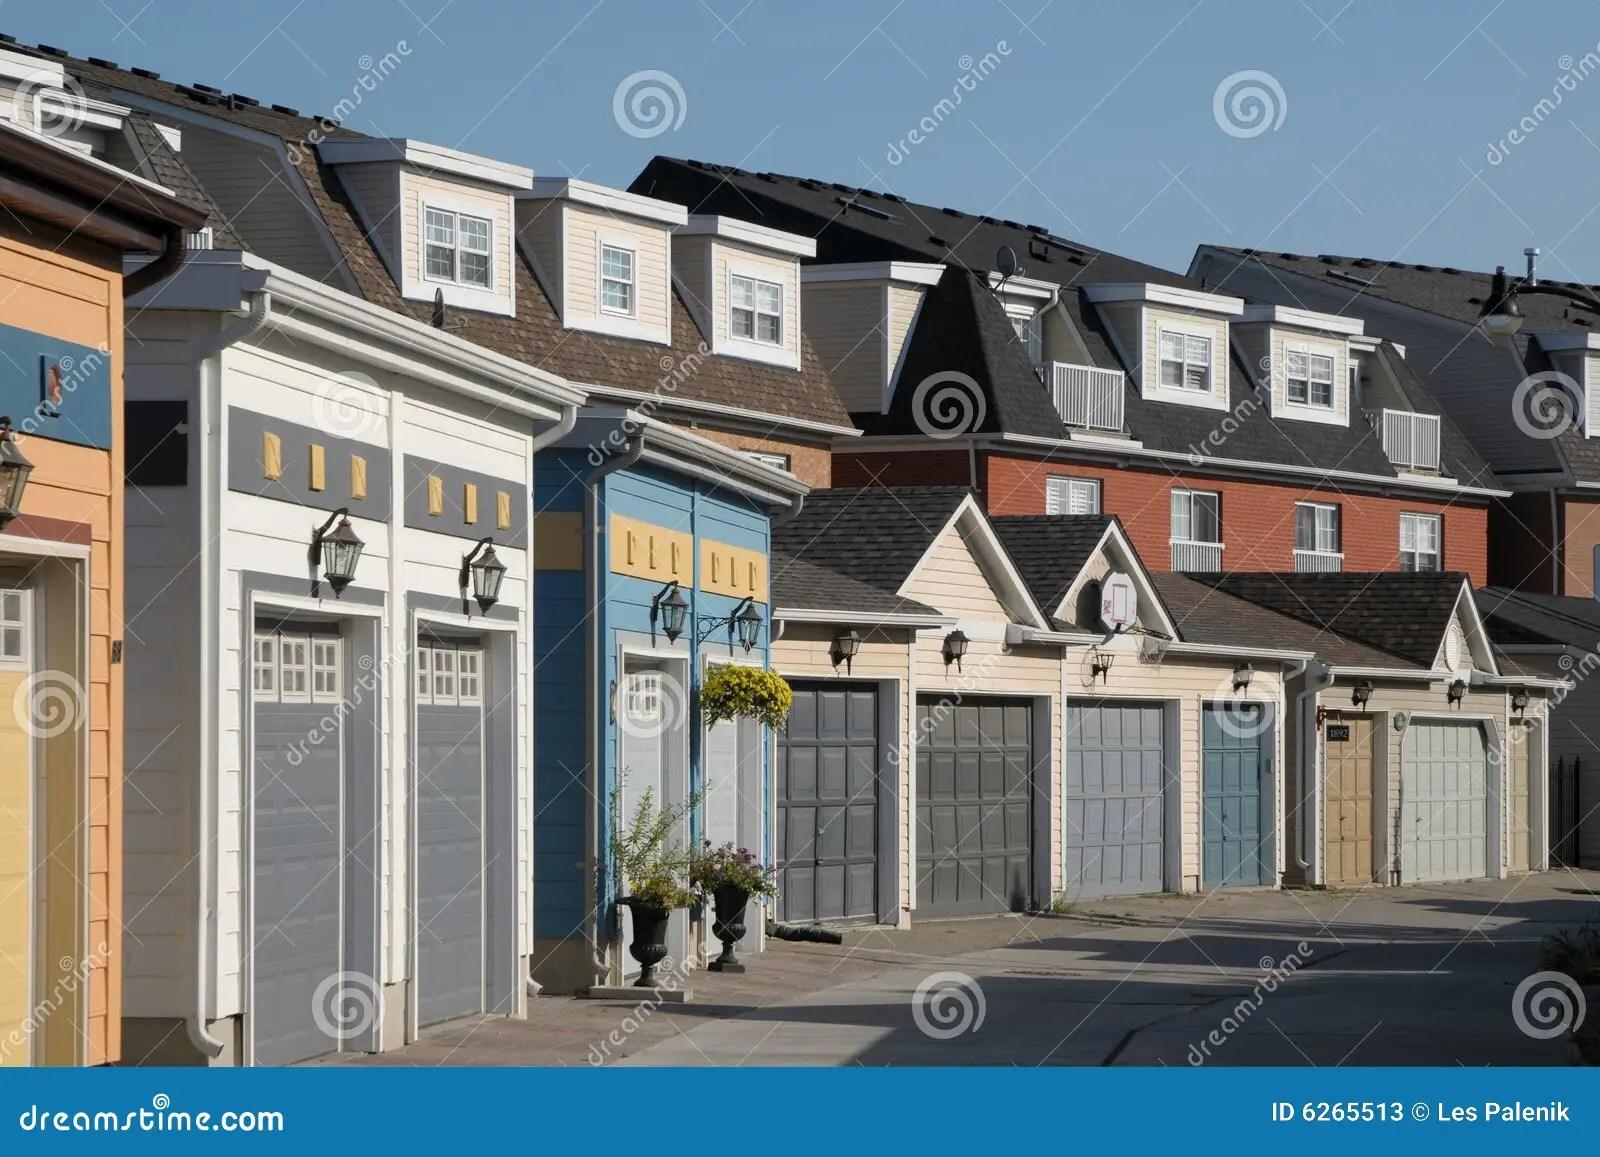 Townhouses With Garage Doors Stock Photos  Image 6265513